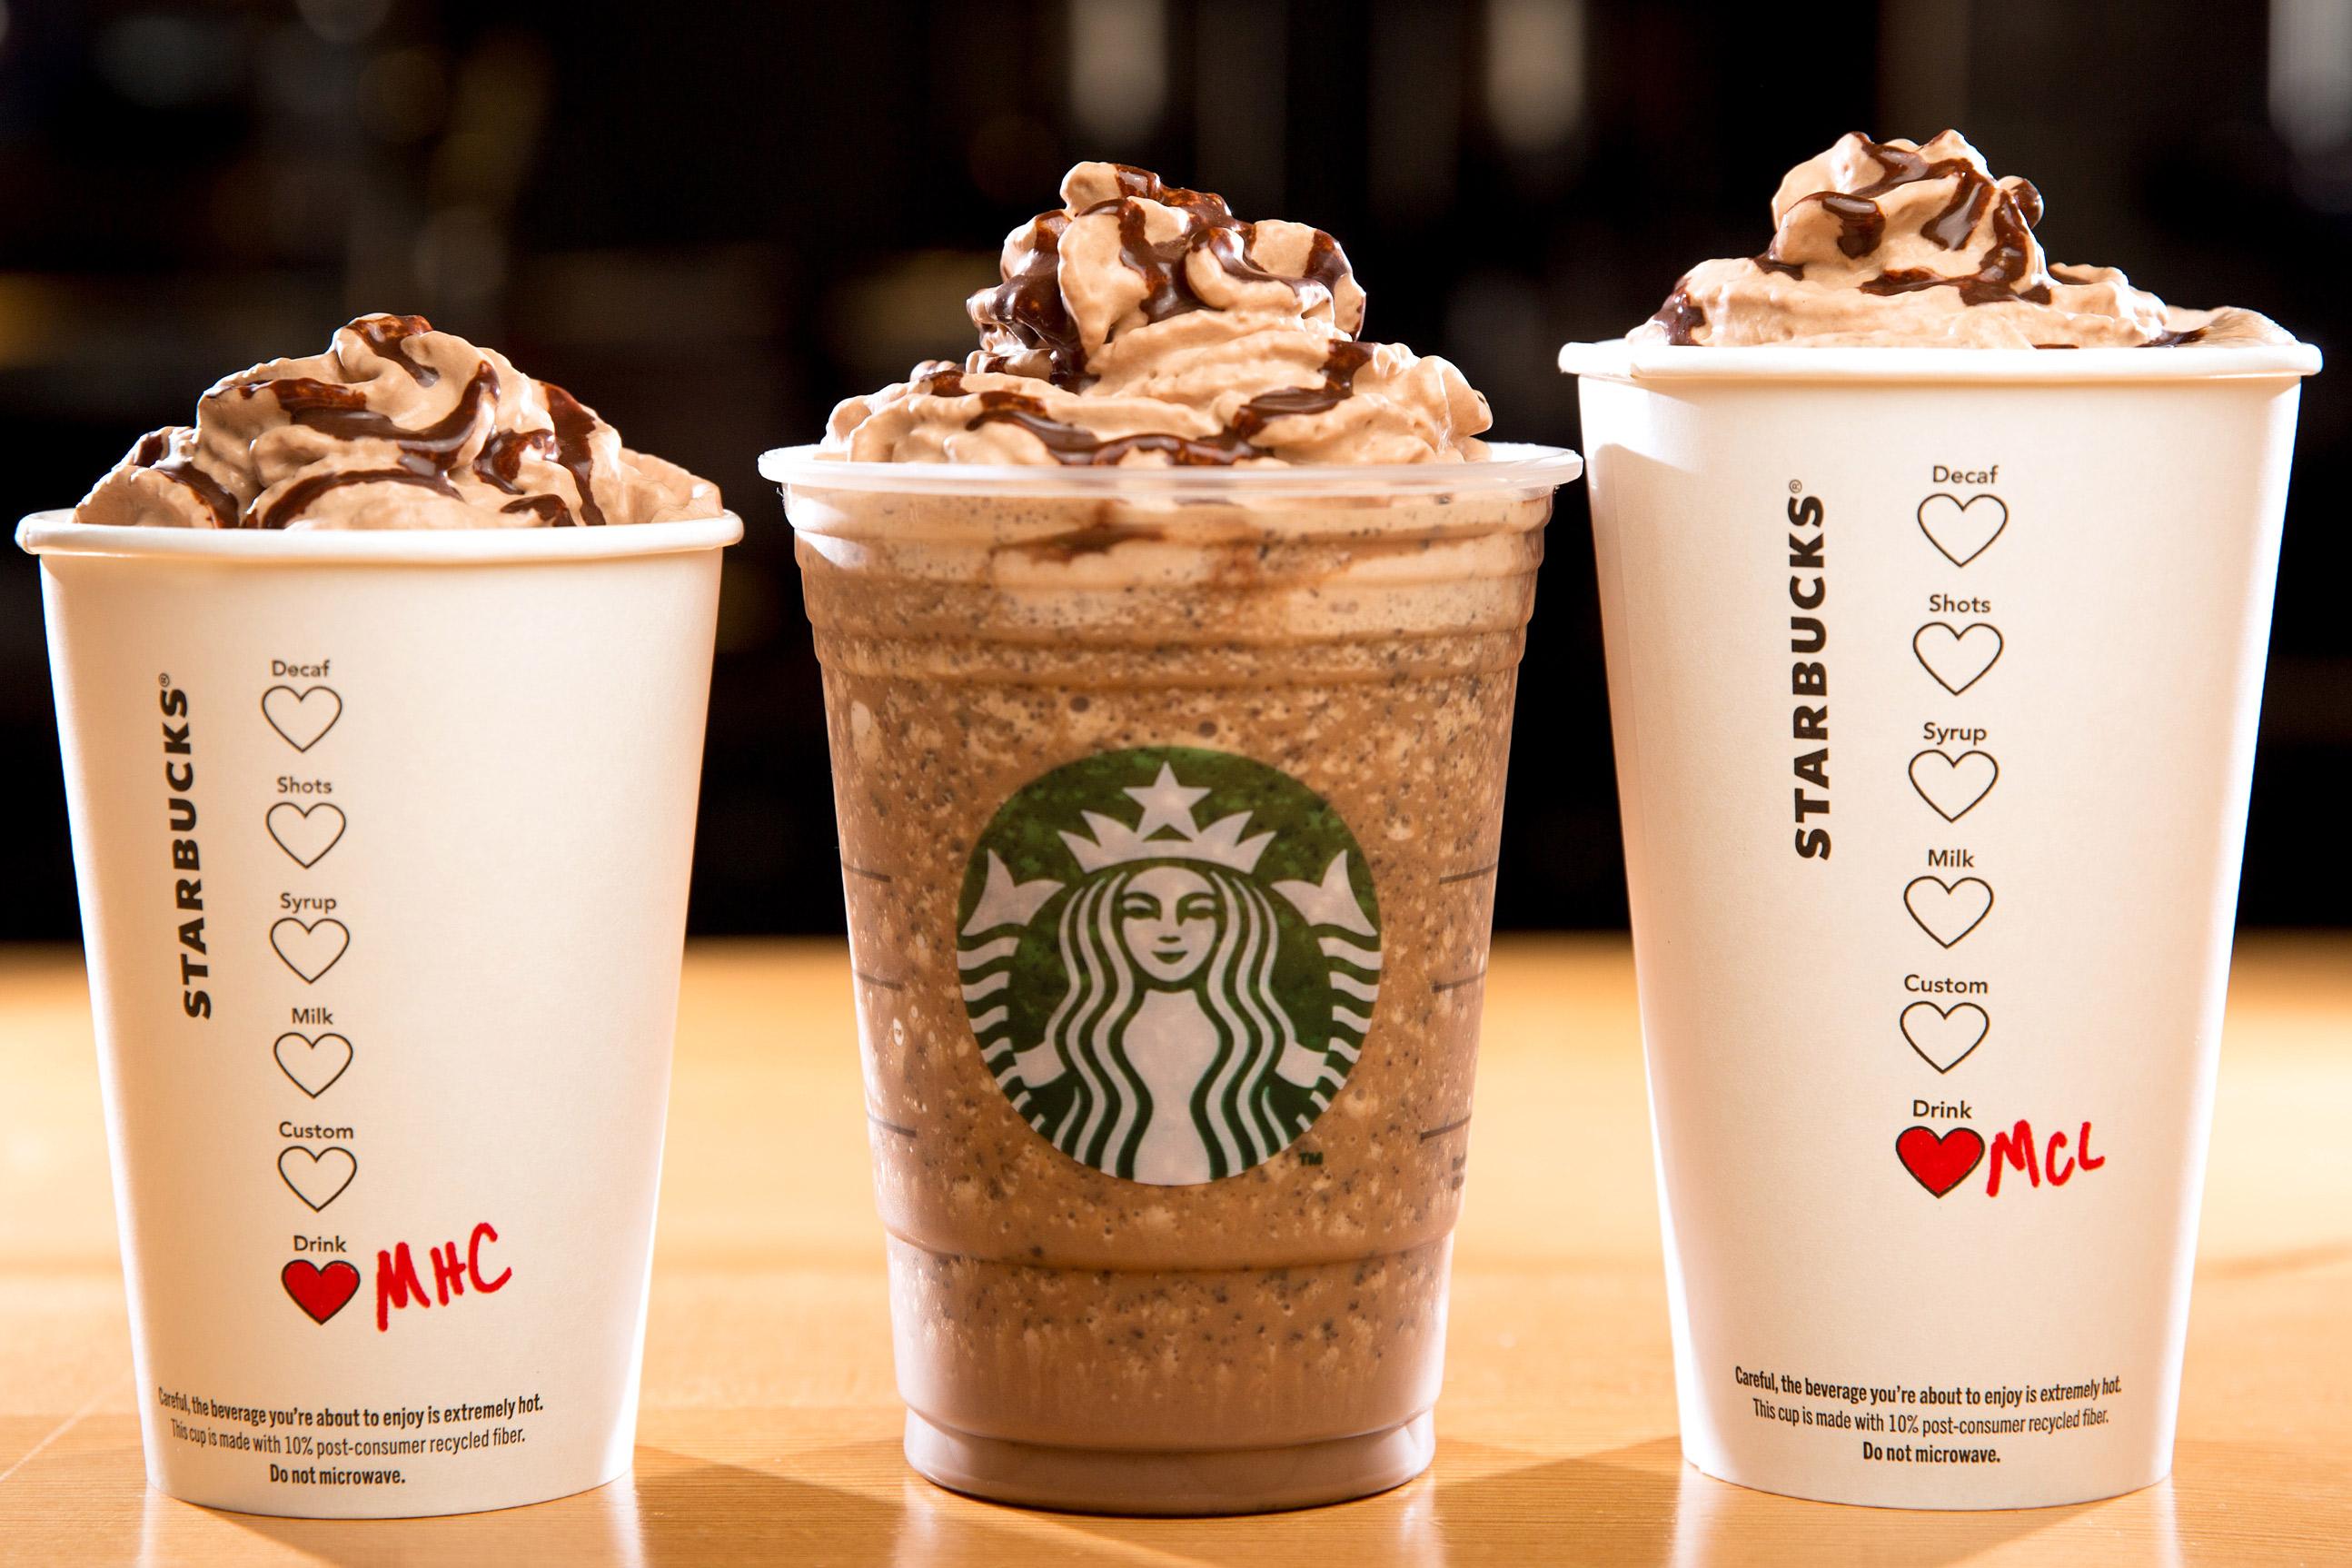 Starbucks beverages